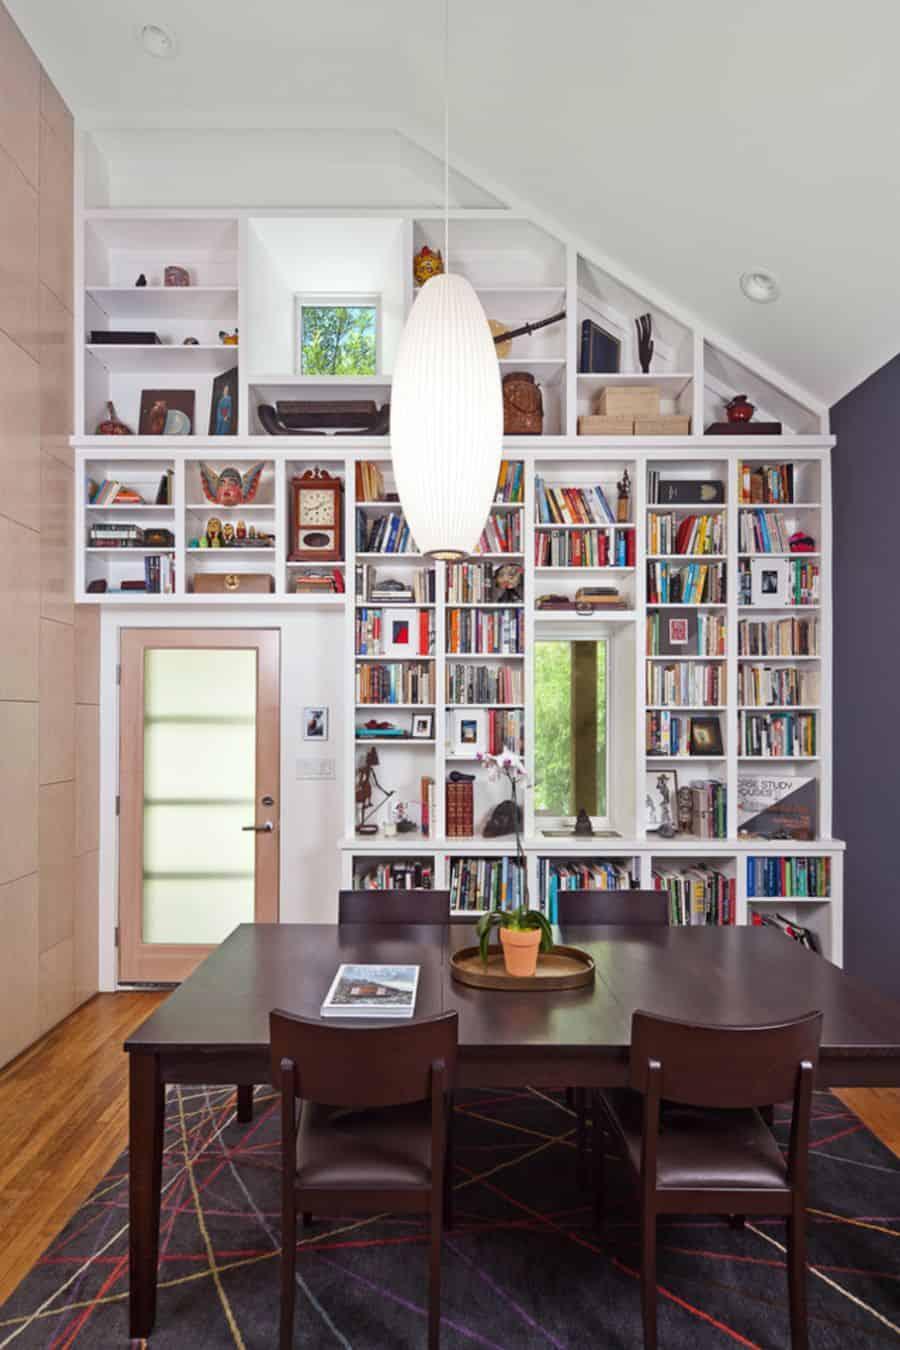 Add a full wall of bookshelves.